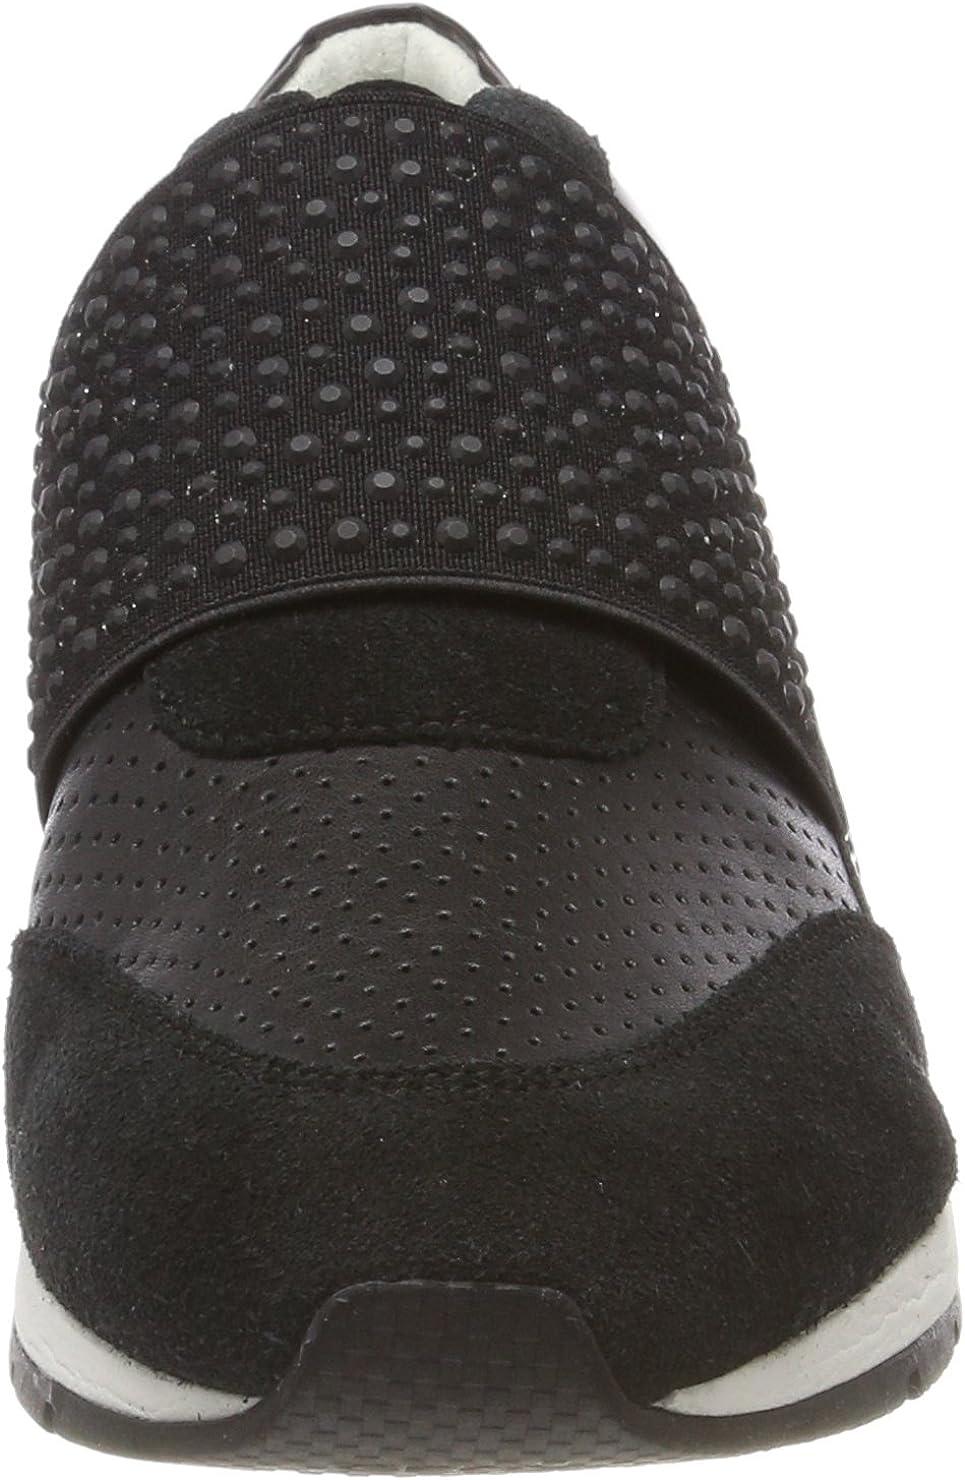 puesto Lo dudo Morgue  Amazon.com: Geox Women's D Shahira A Trainers: Shoes